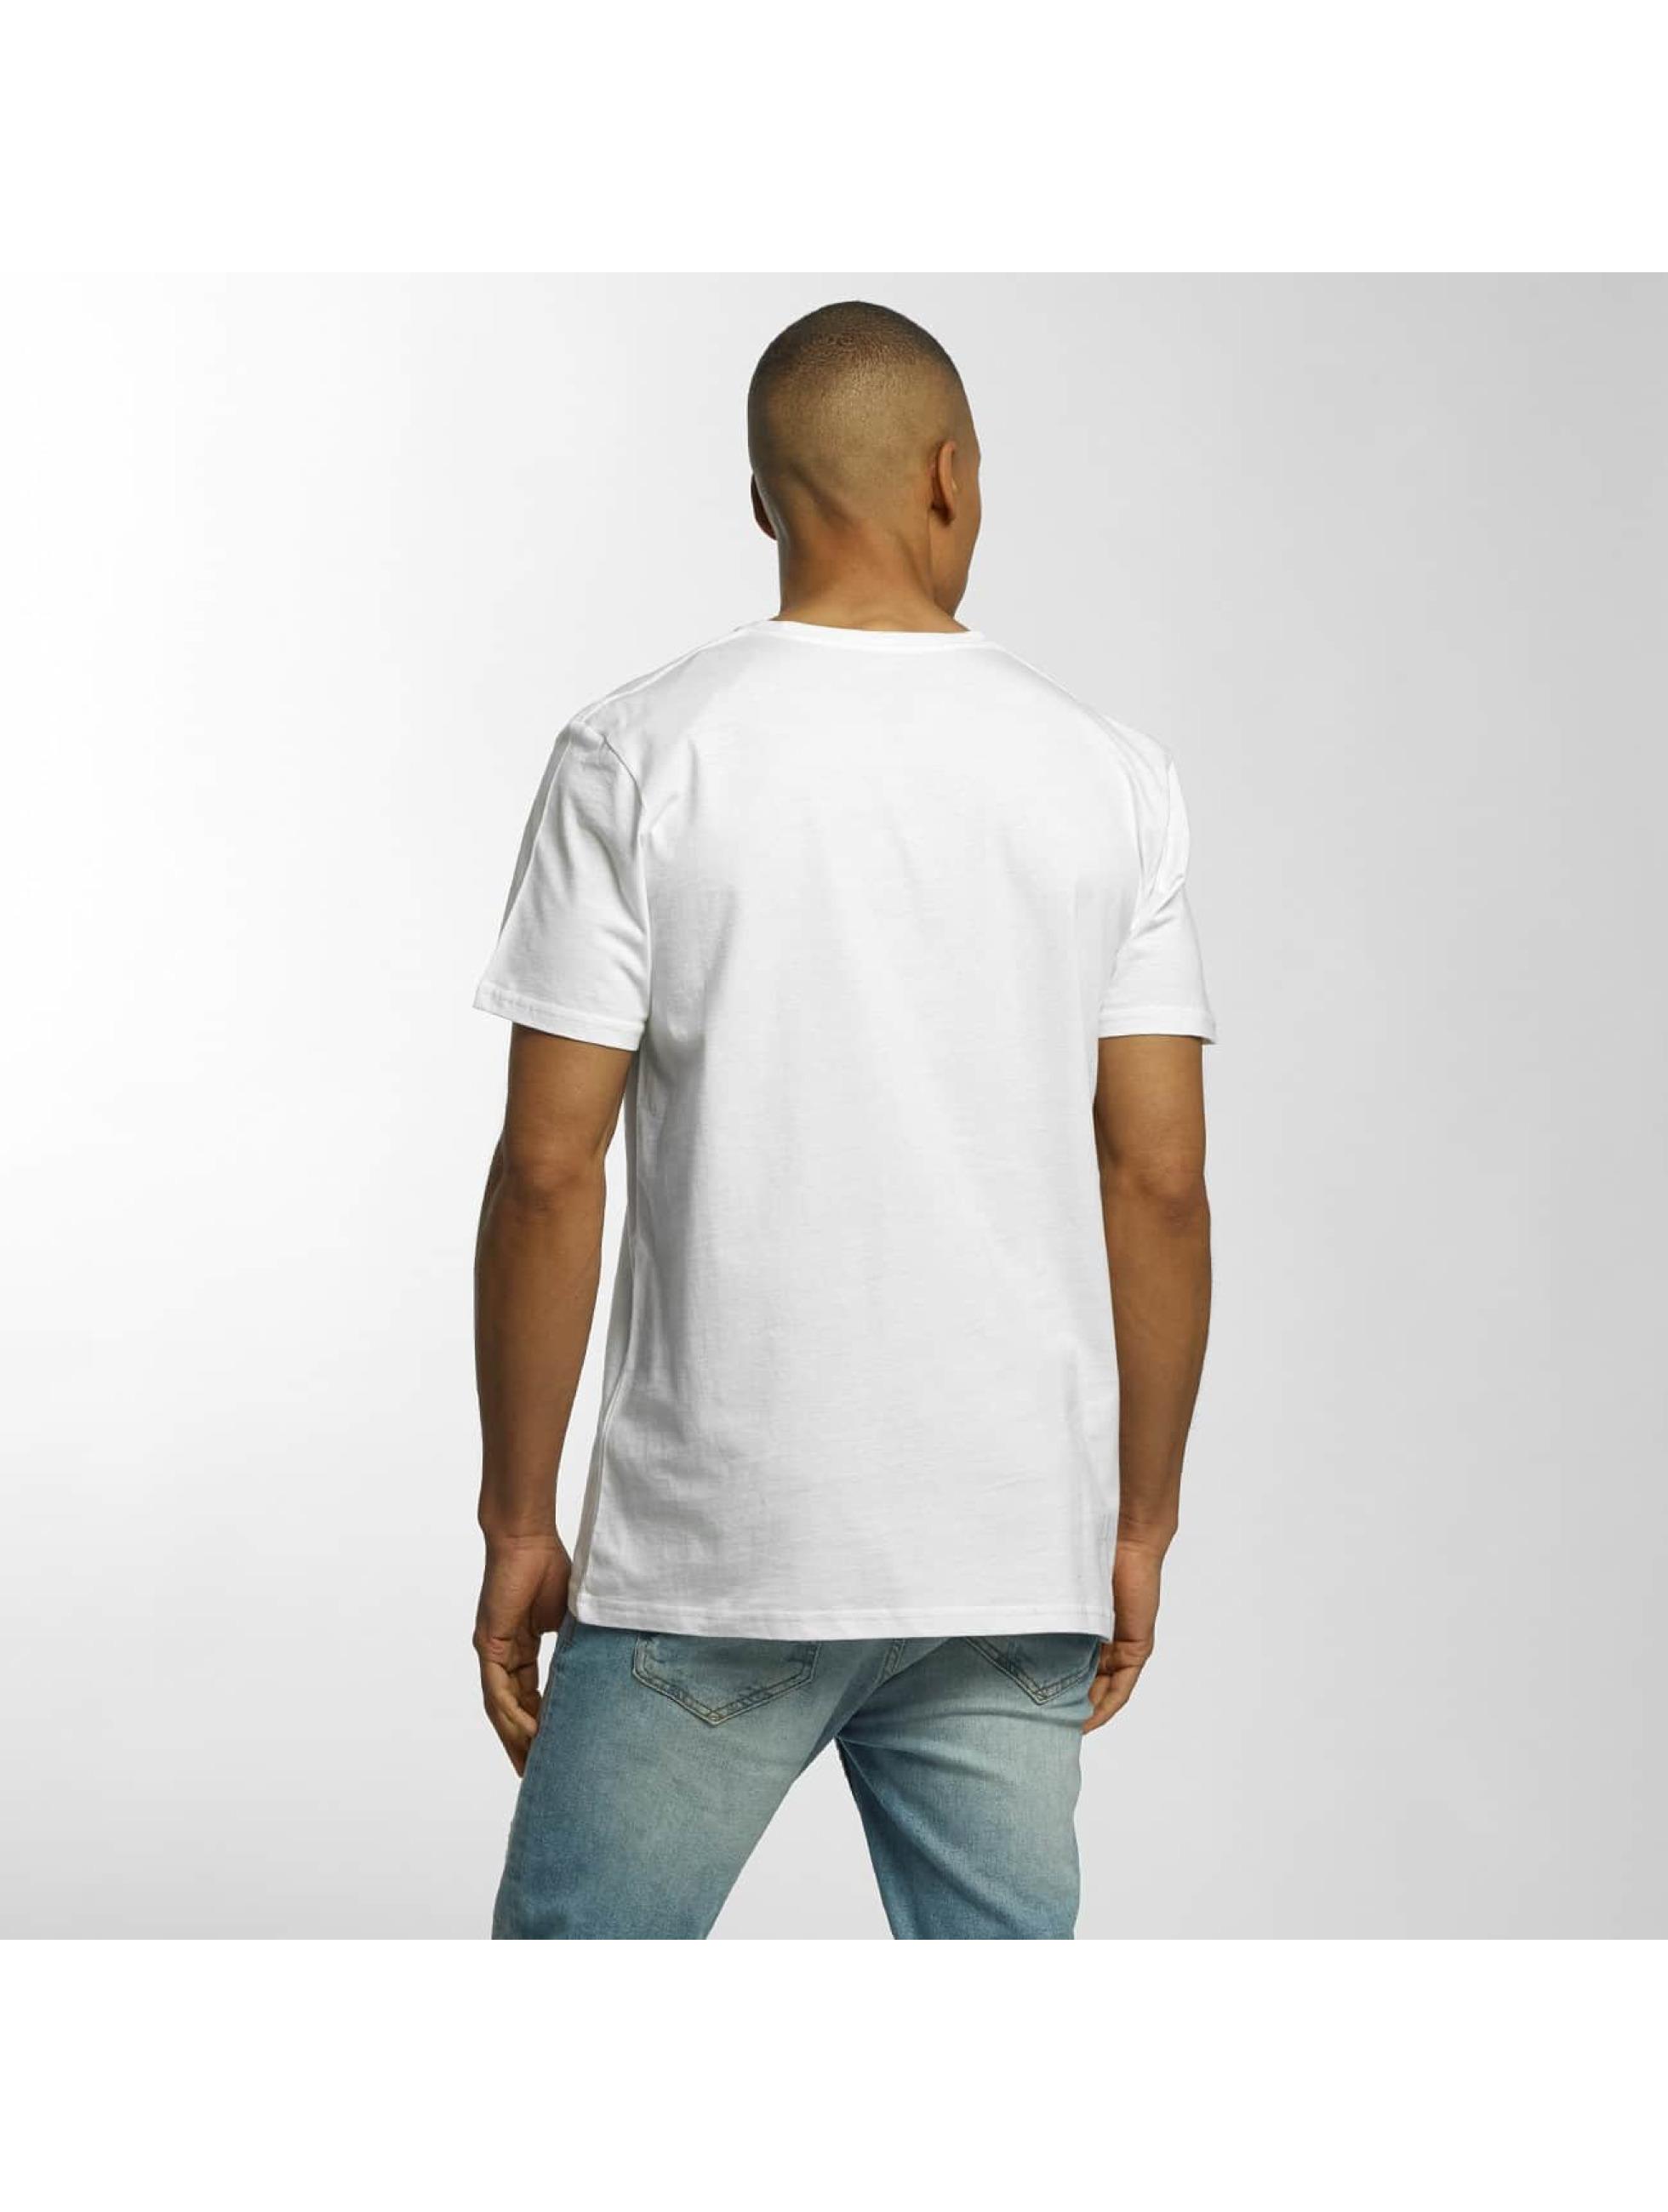 Quiksilver T-Shirt Classic Sea Tales white